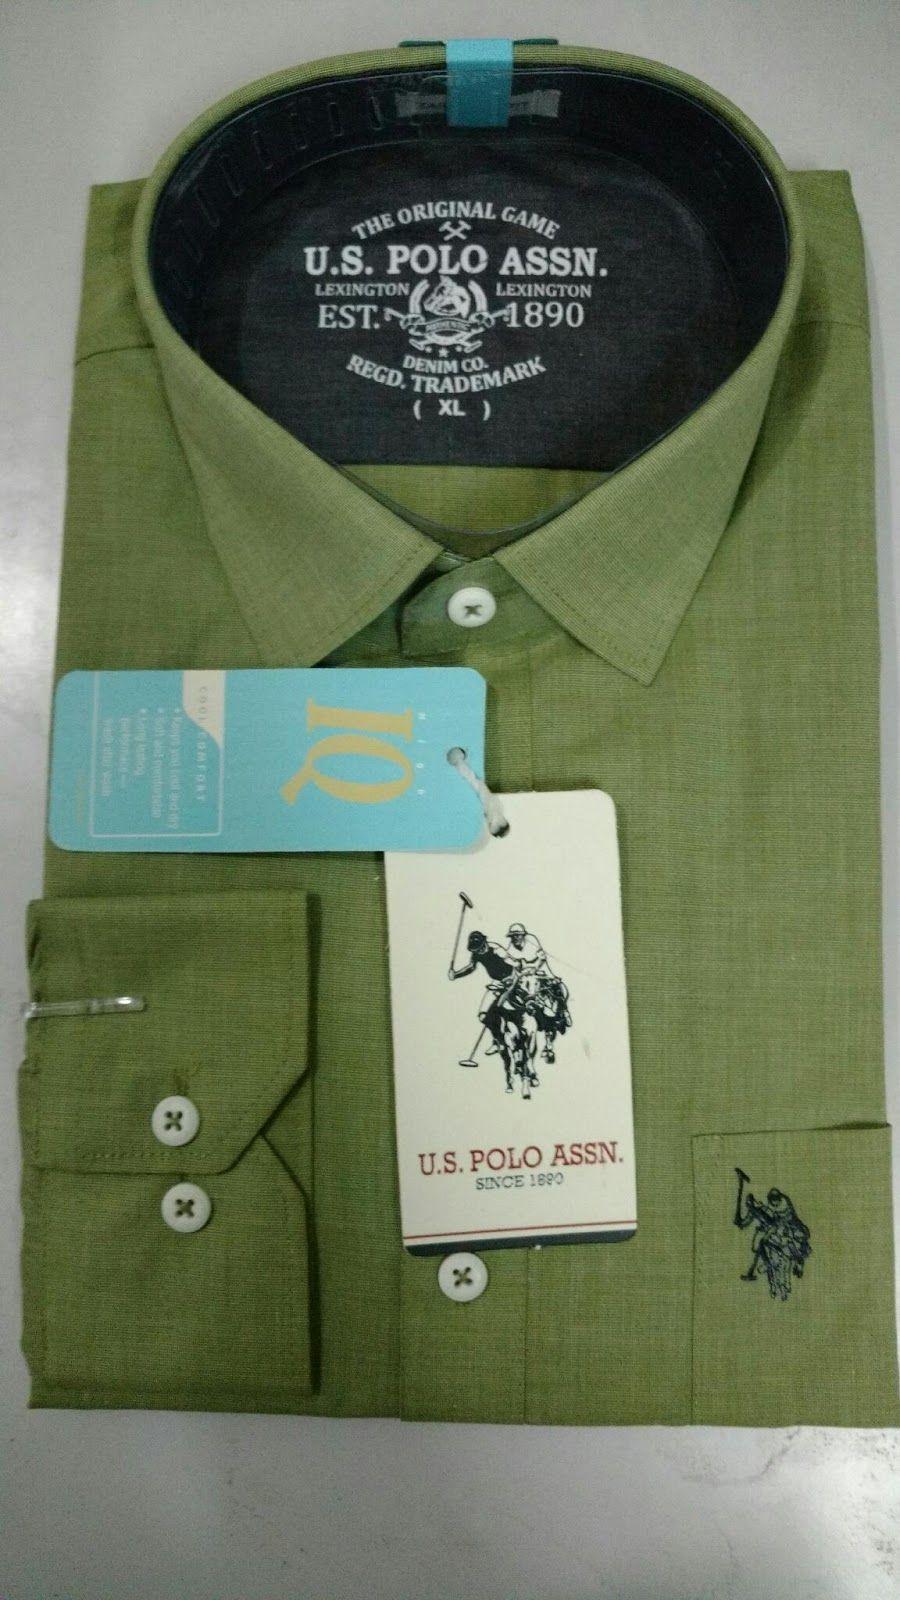 Us Polo Assn Original Light Green Shirt Mrp Rs 2599 Branded Products For Sale Levi S Brand Original Shirt Green Shirt